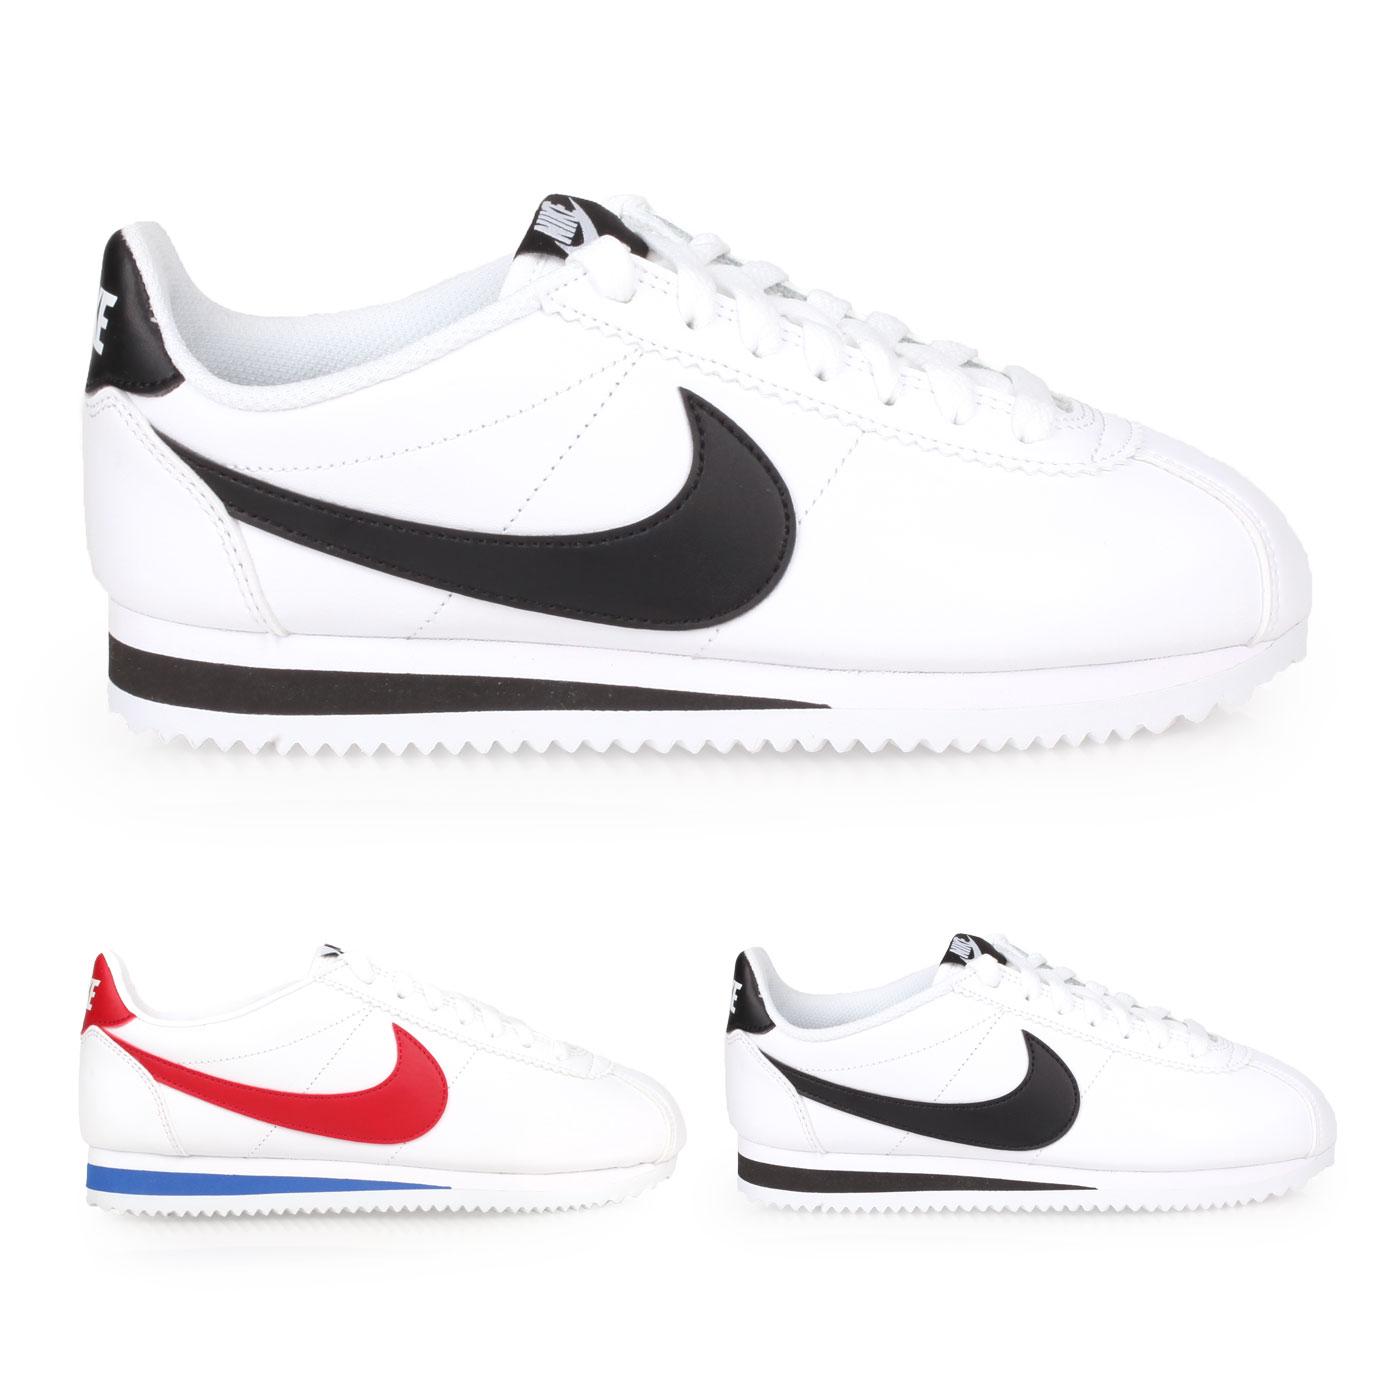 NIKE 女款休閒鞋  @WMNS CLASSIC CORTEZ LEATHER@807471101